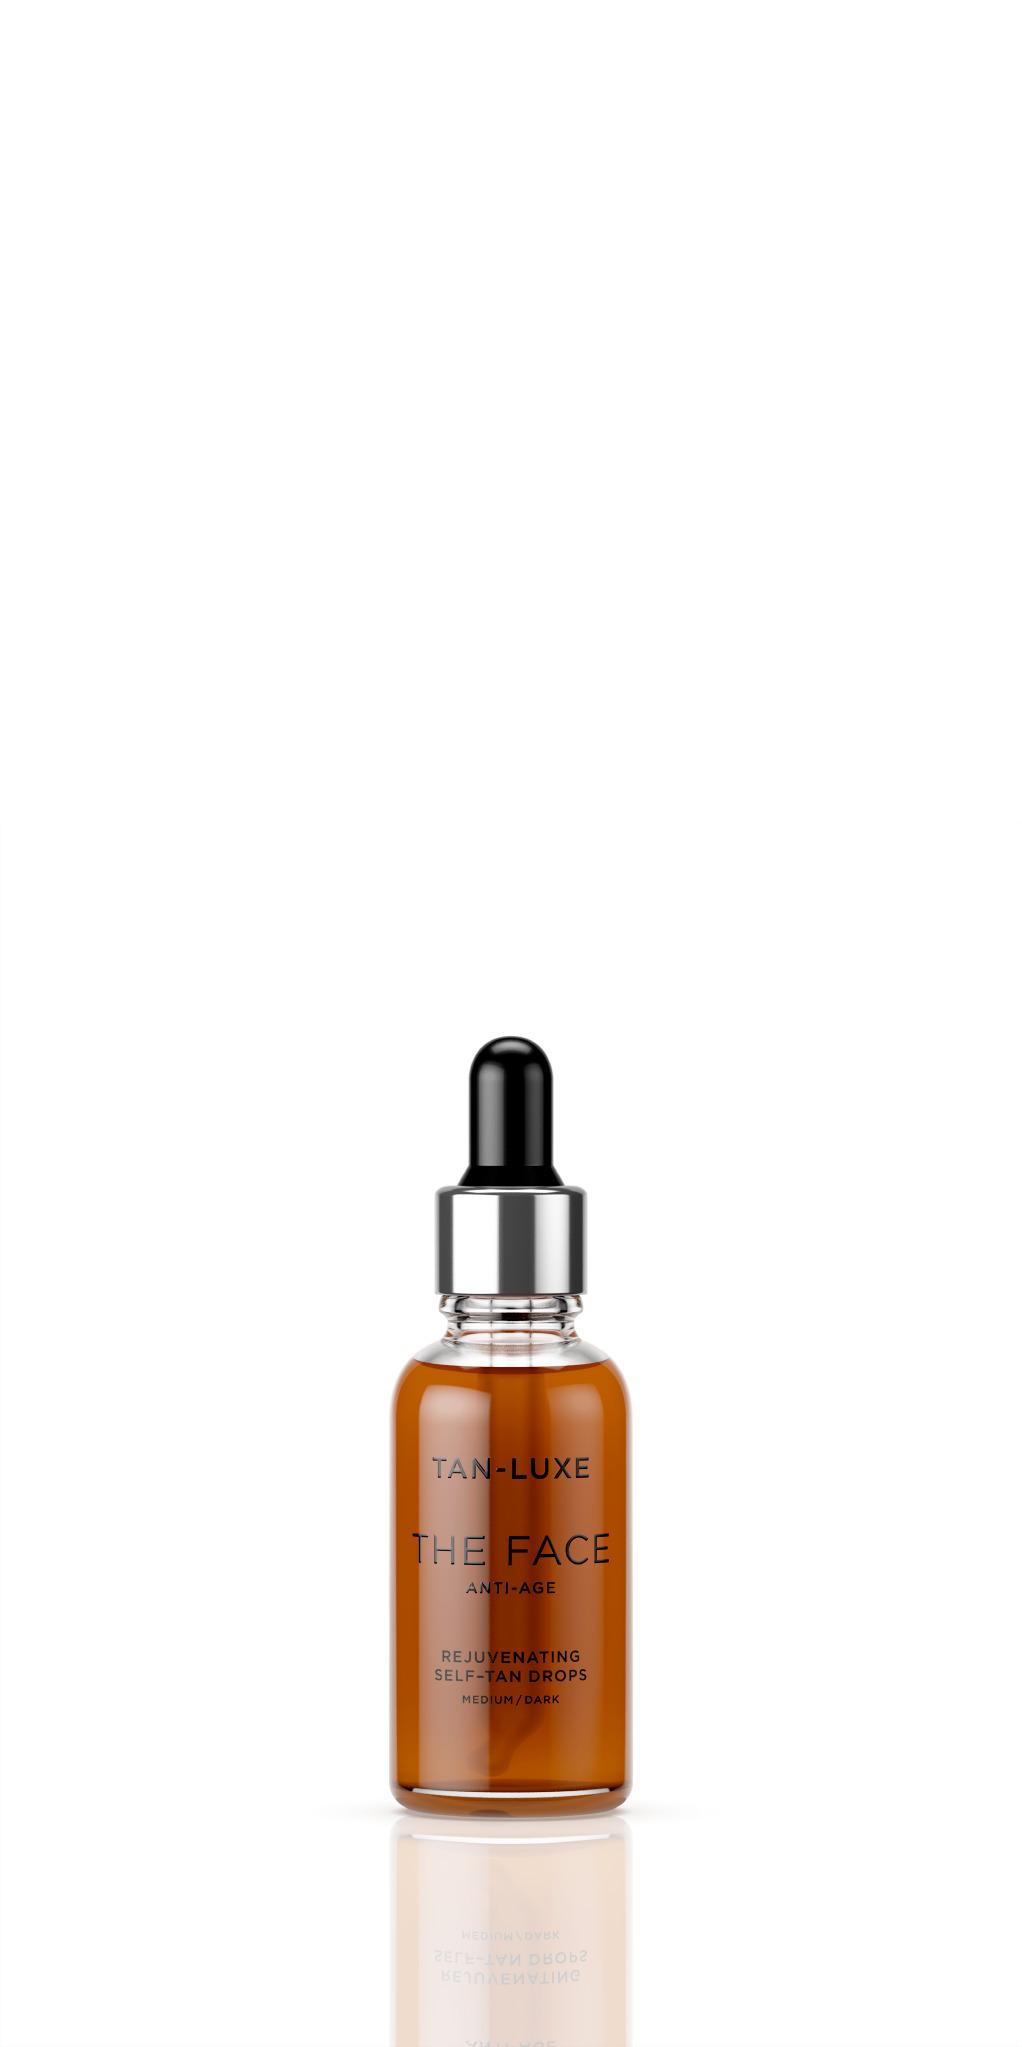 Tan Luxe The Face anti-age selvbruner dråber, 30 ml, medium/dark